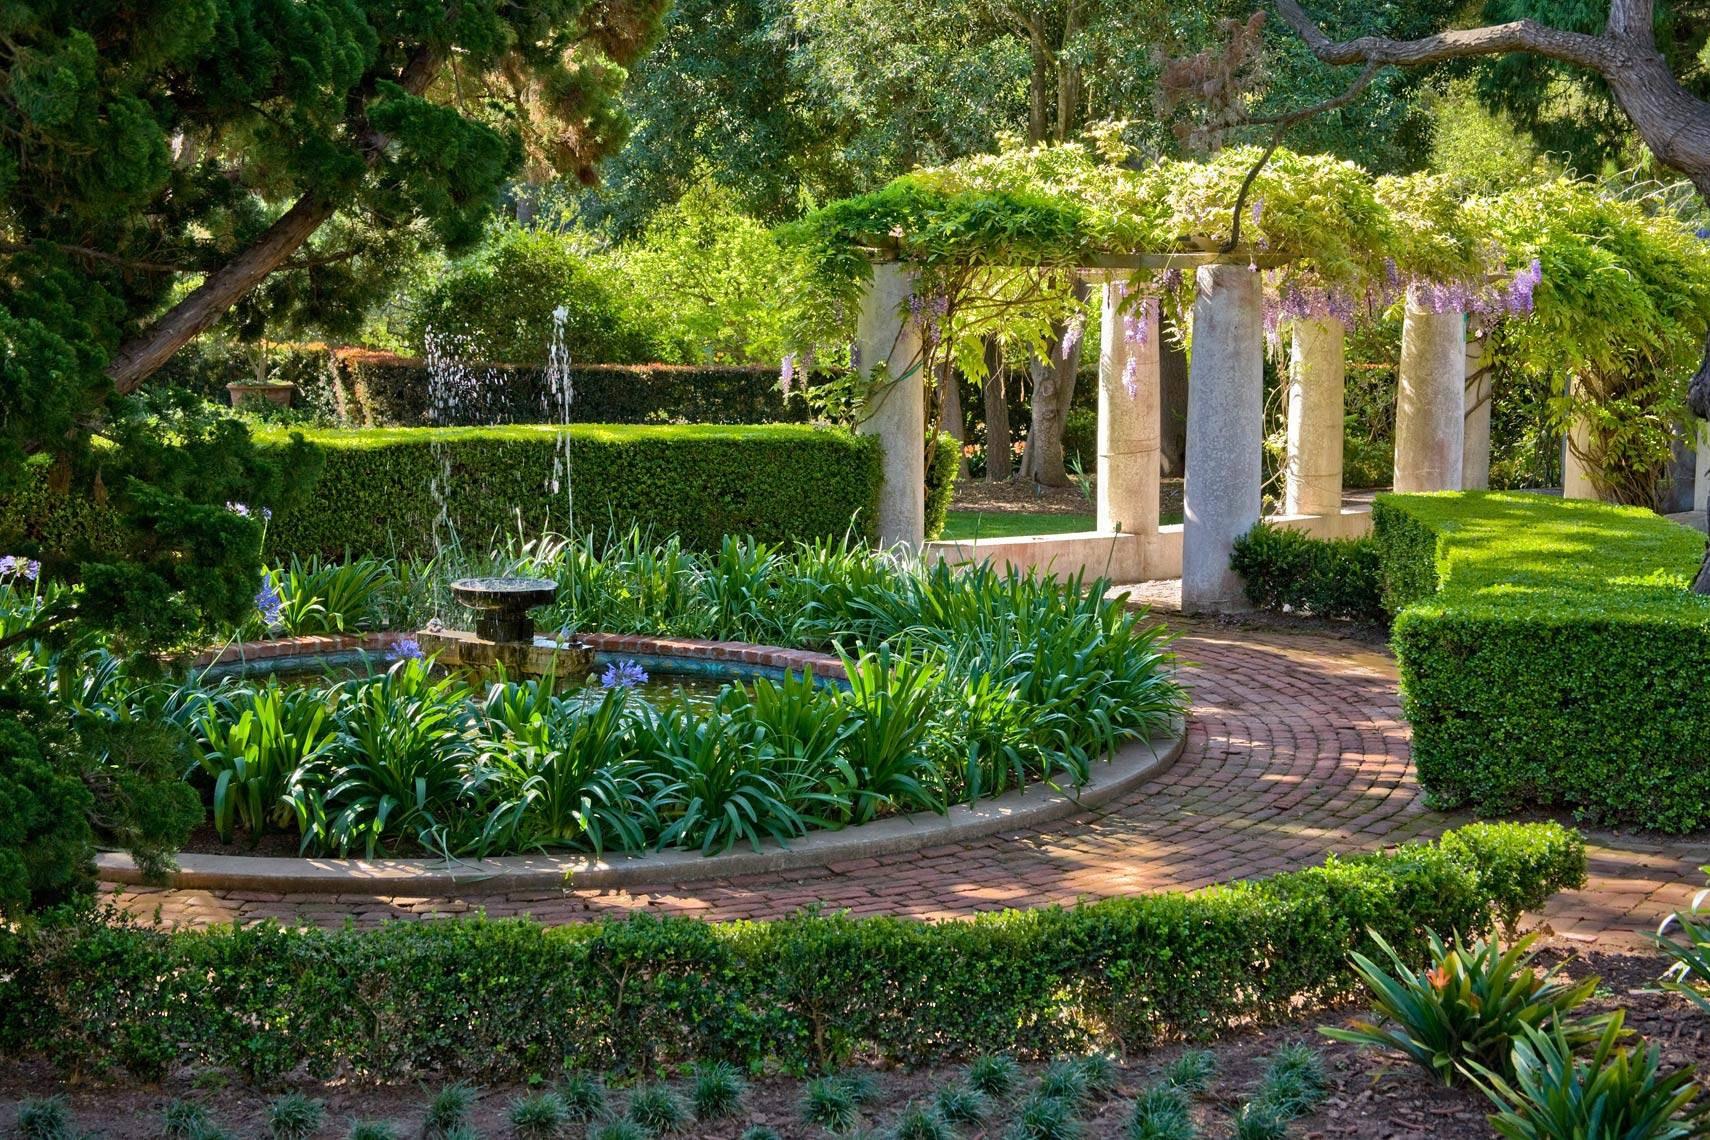 Best ideas about Garden Landscape Ideas . Save or Pin 15 Refreshing Mediterranean Landscape Designs For A Now.